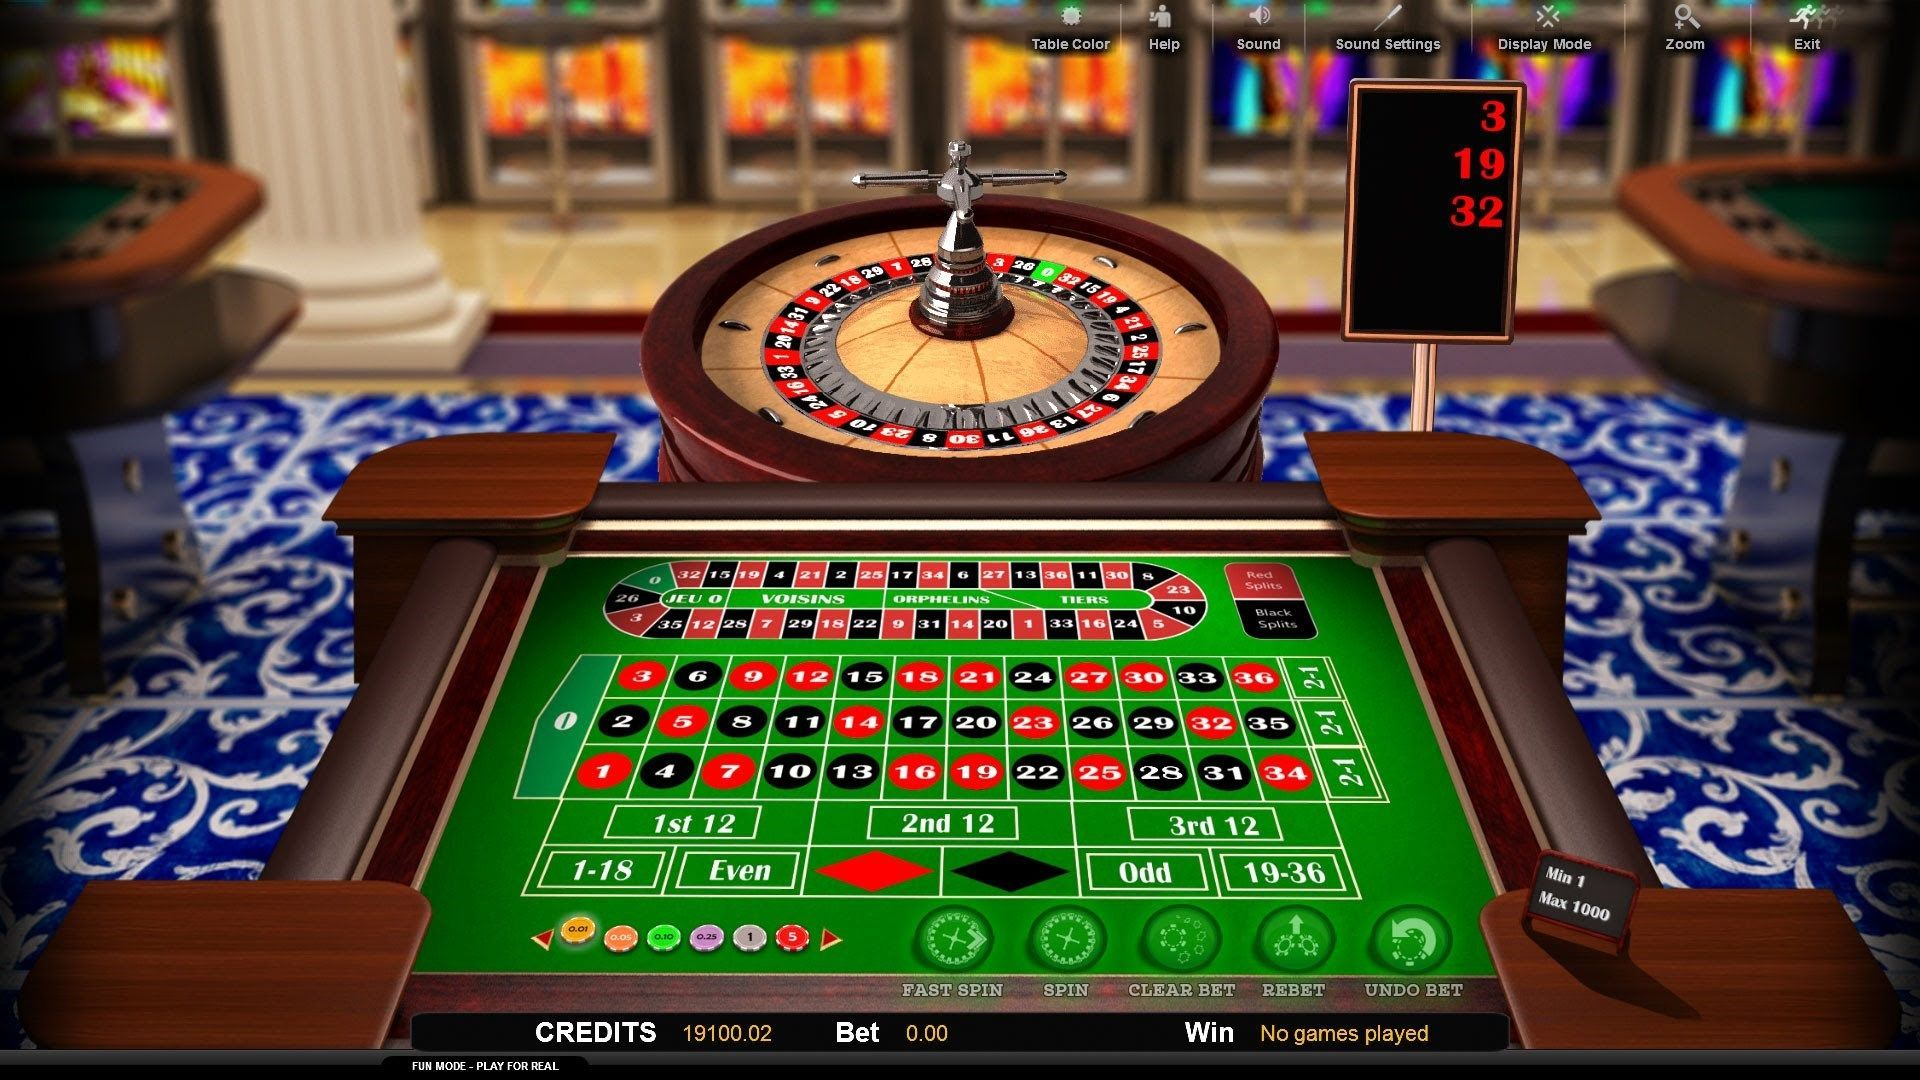 Online casino Malaysia – ways to earn money easily